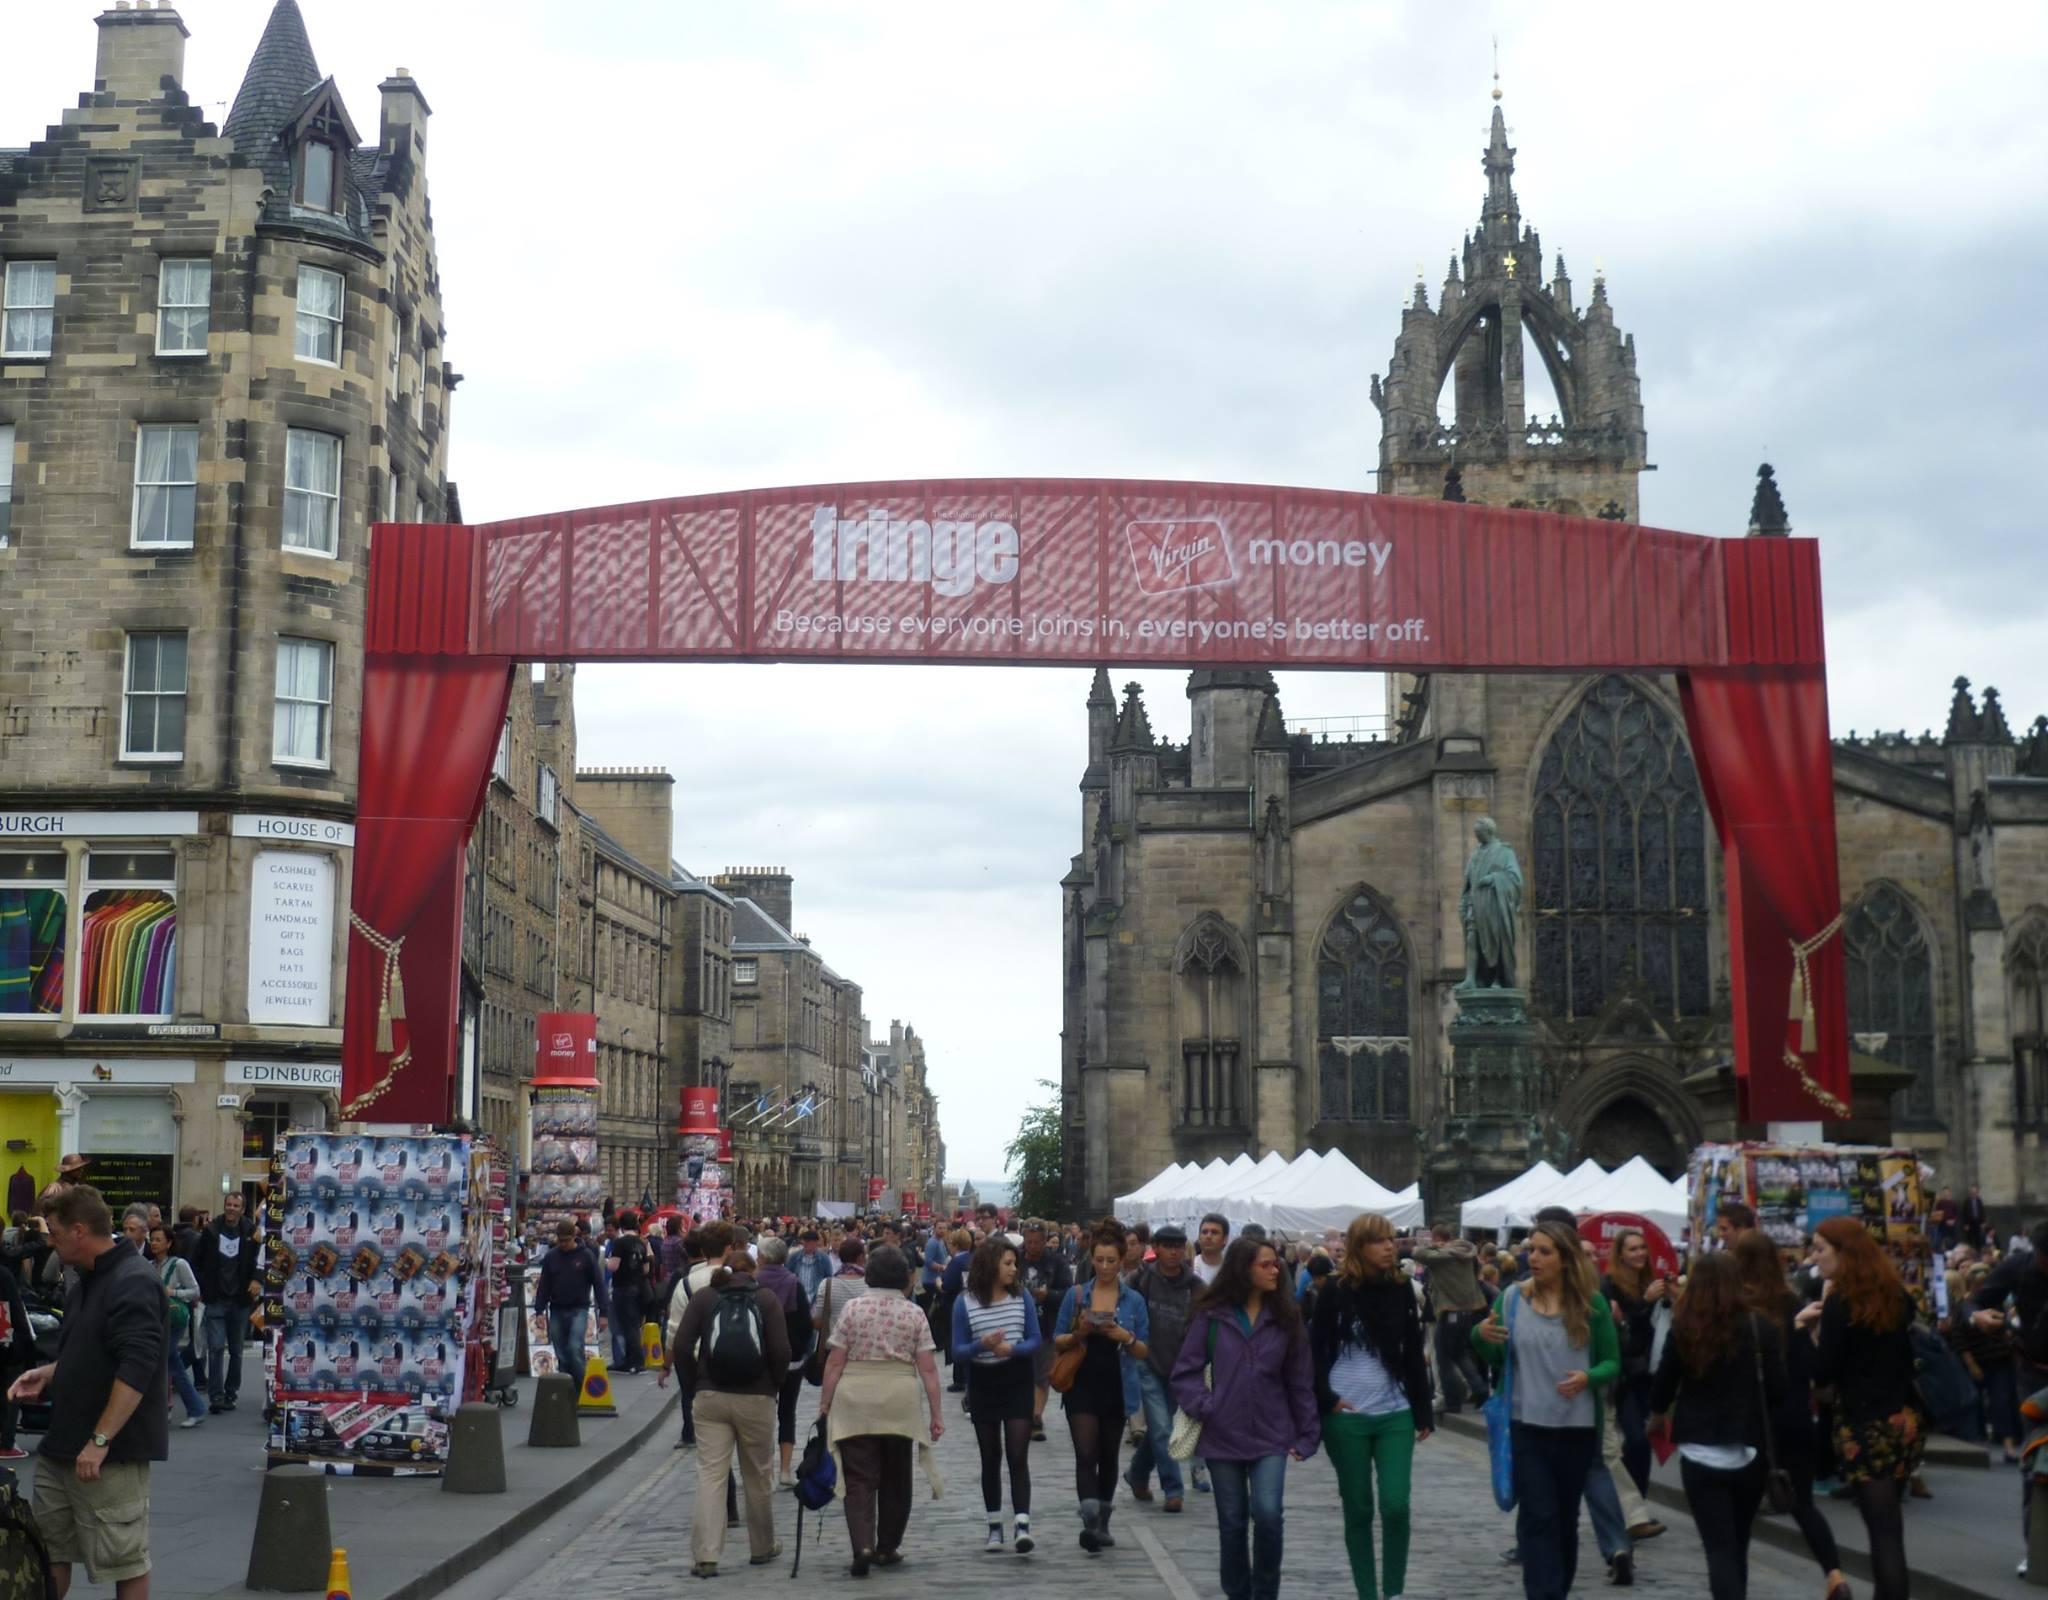 Oxford's summer at the Edinburgh Fringe